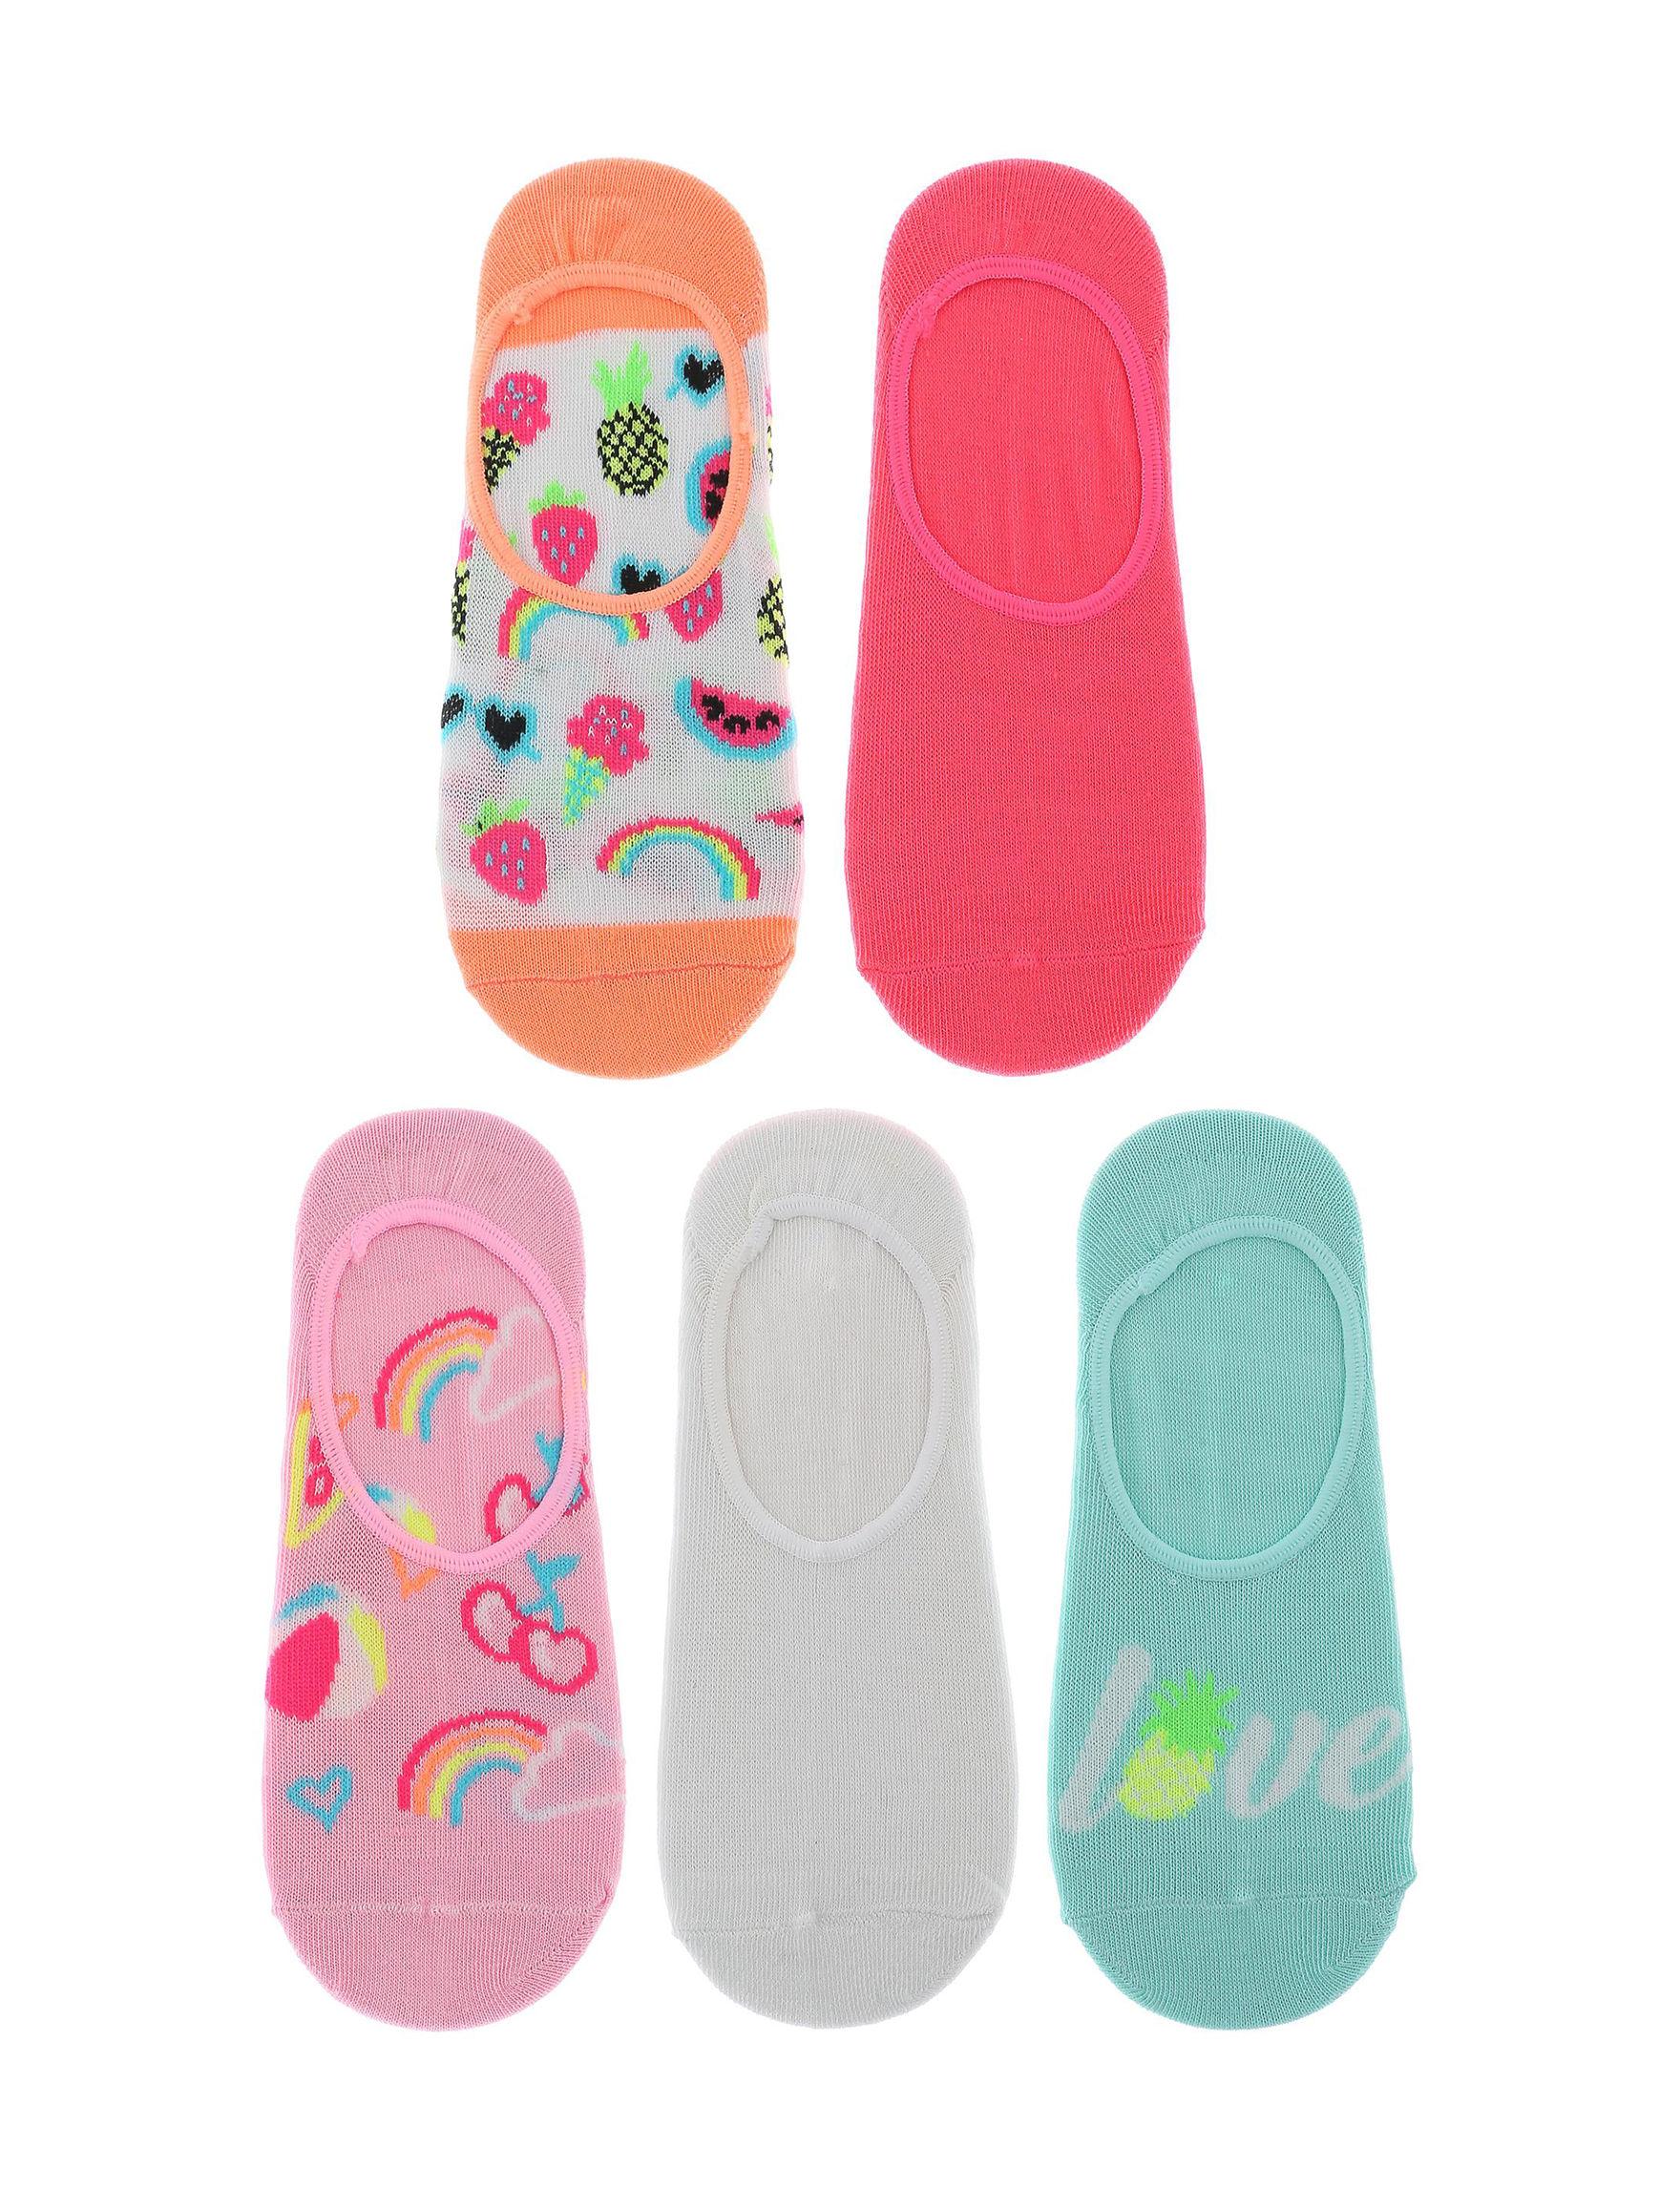 Capelli Pink Multi Socks